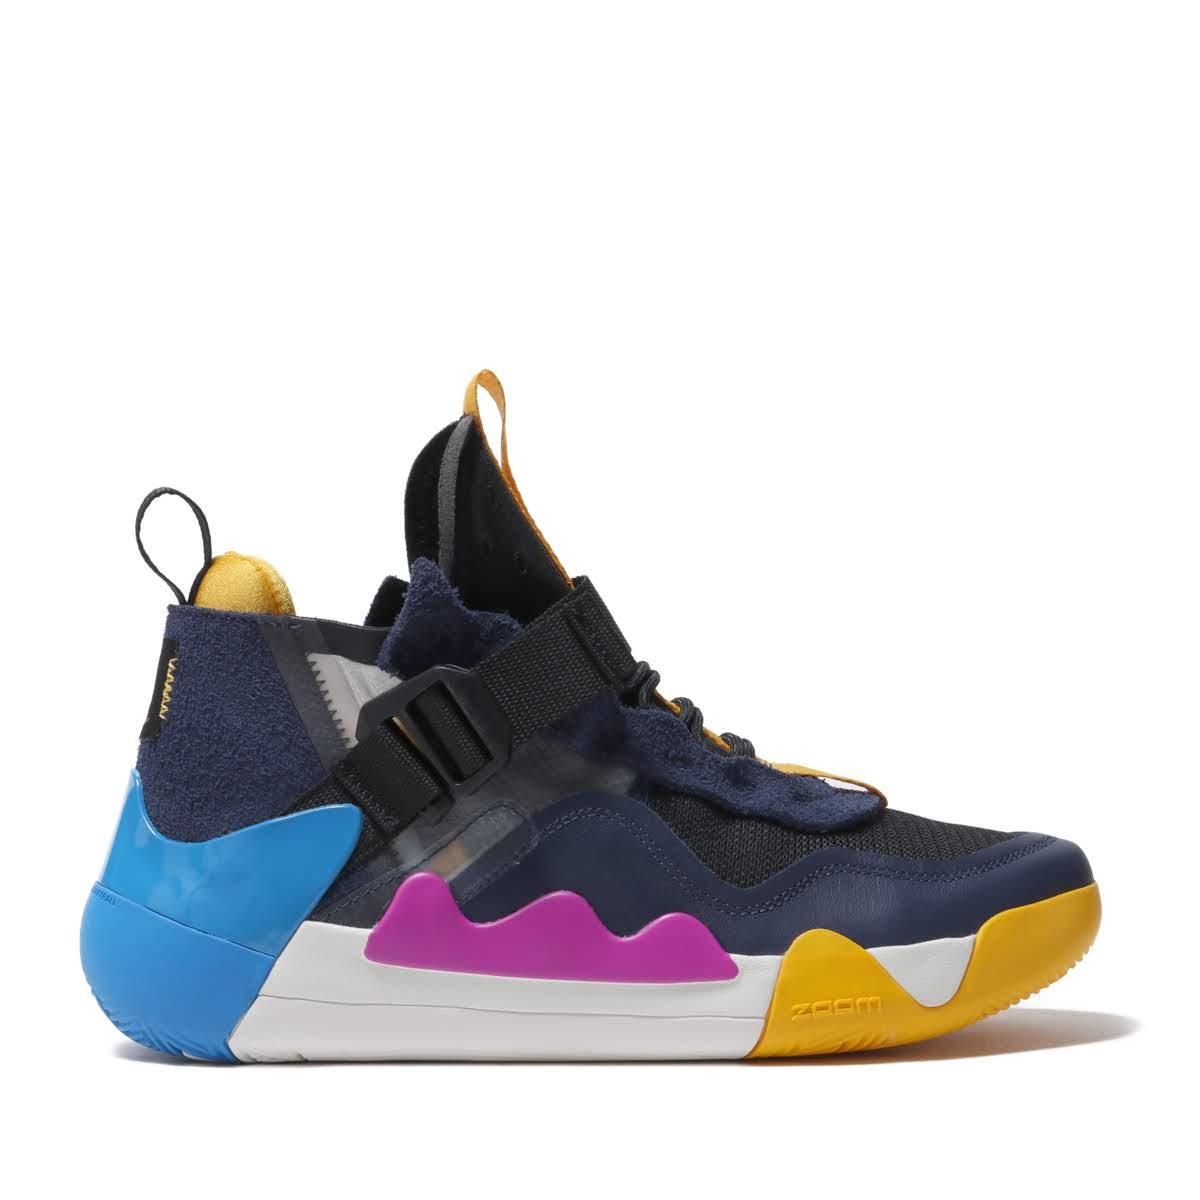 c7702b5246 NIKE JORDAN DEFY SP (BLACK/HYPER VIOLET-MIDNIGHT NAVY) (Nike Jordan DEFY SP)